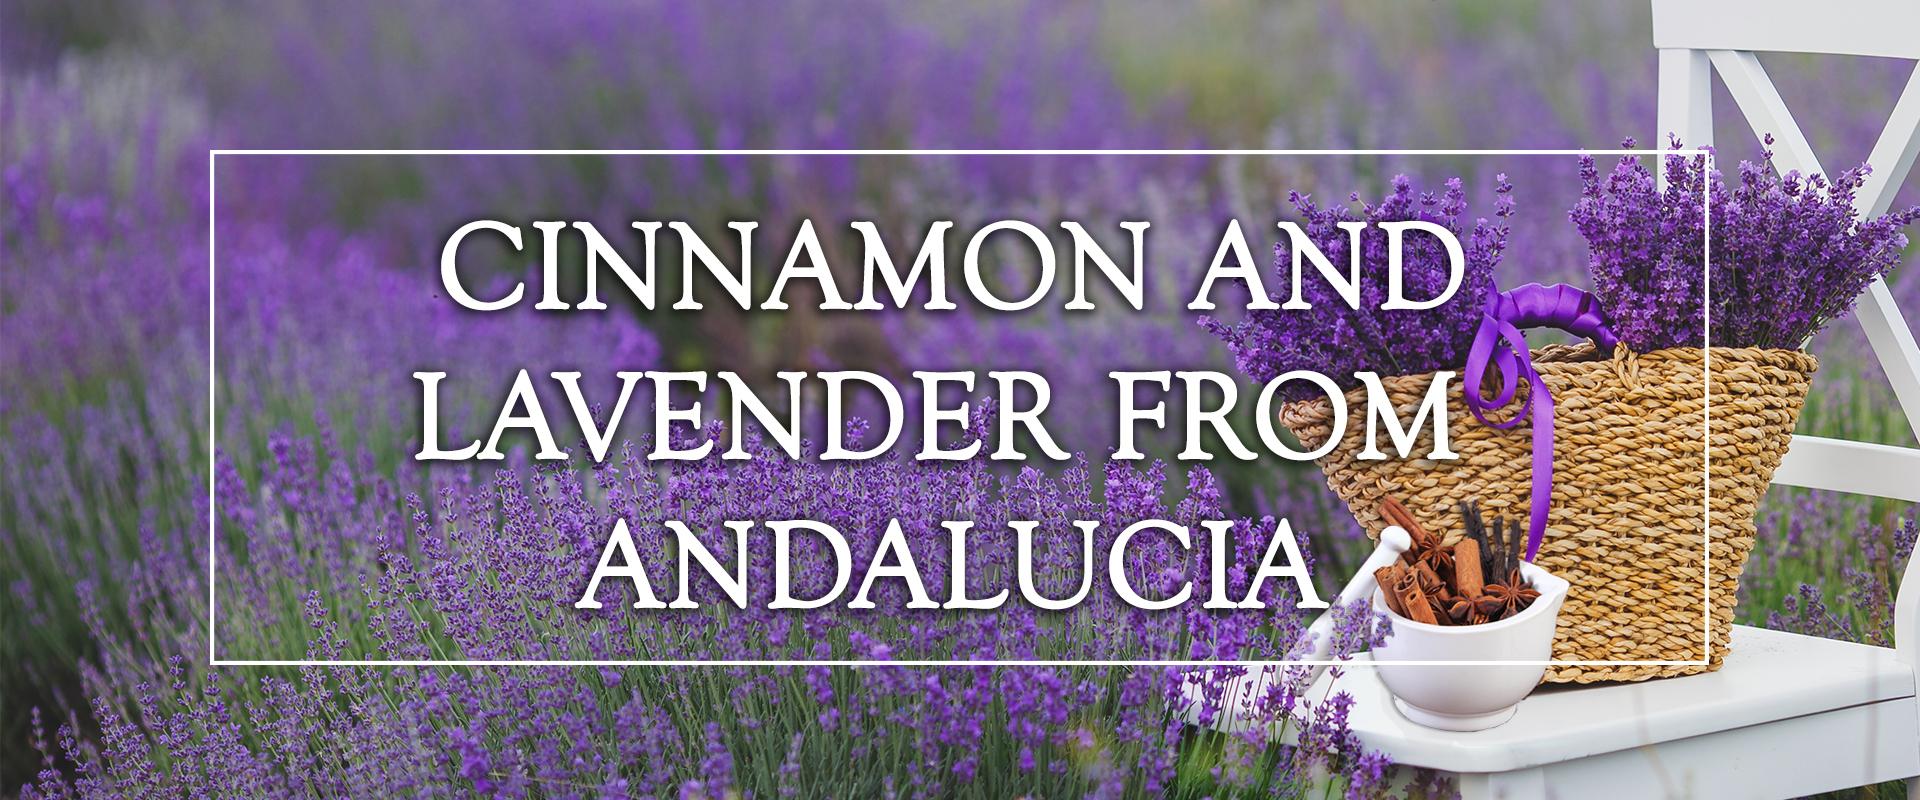 perlola cinnamon and lavender